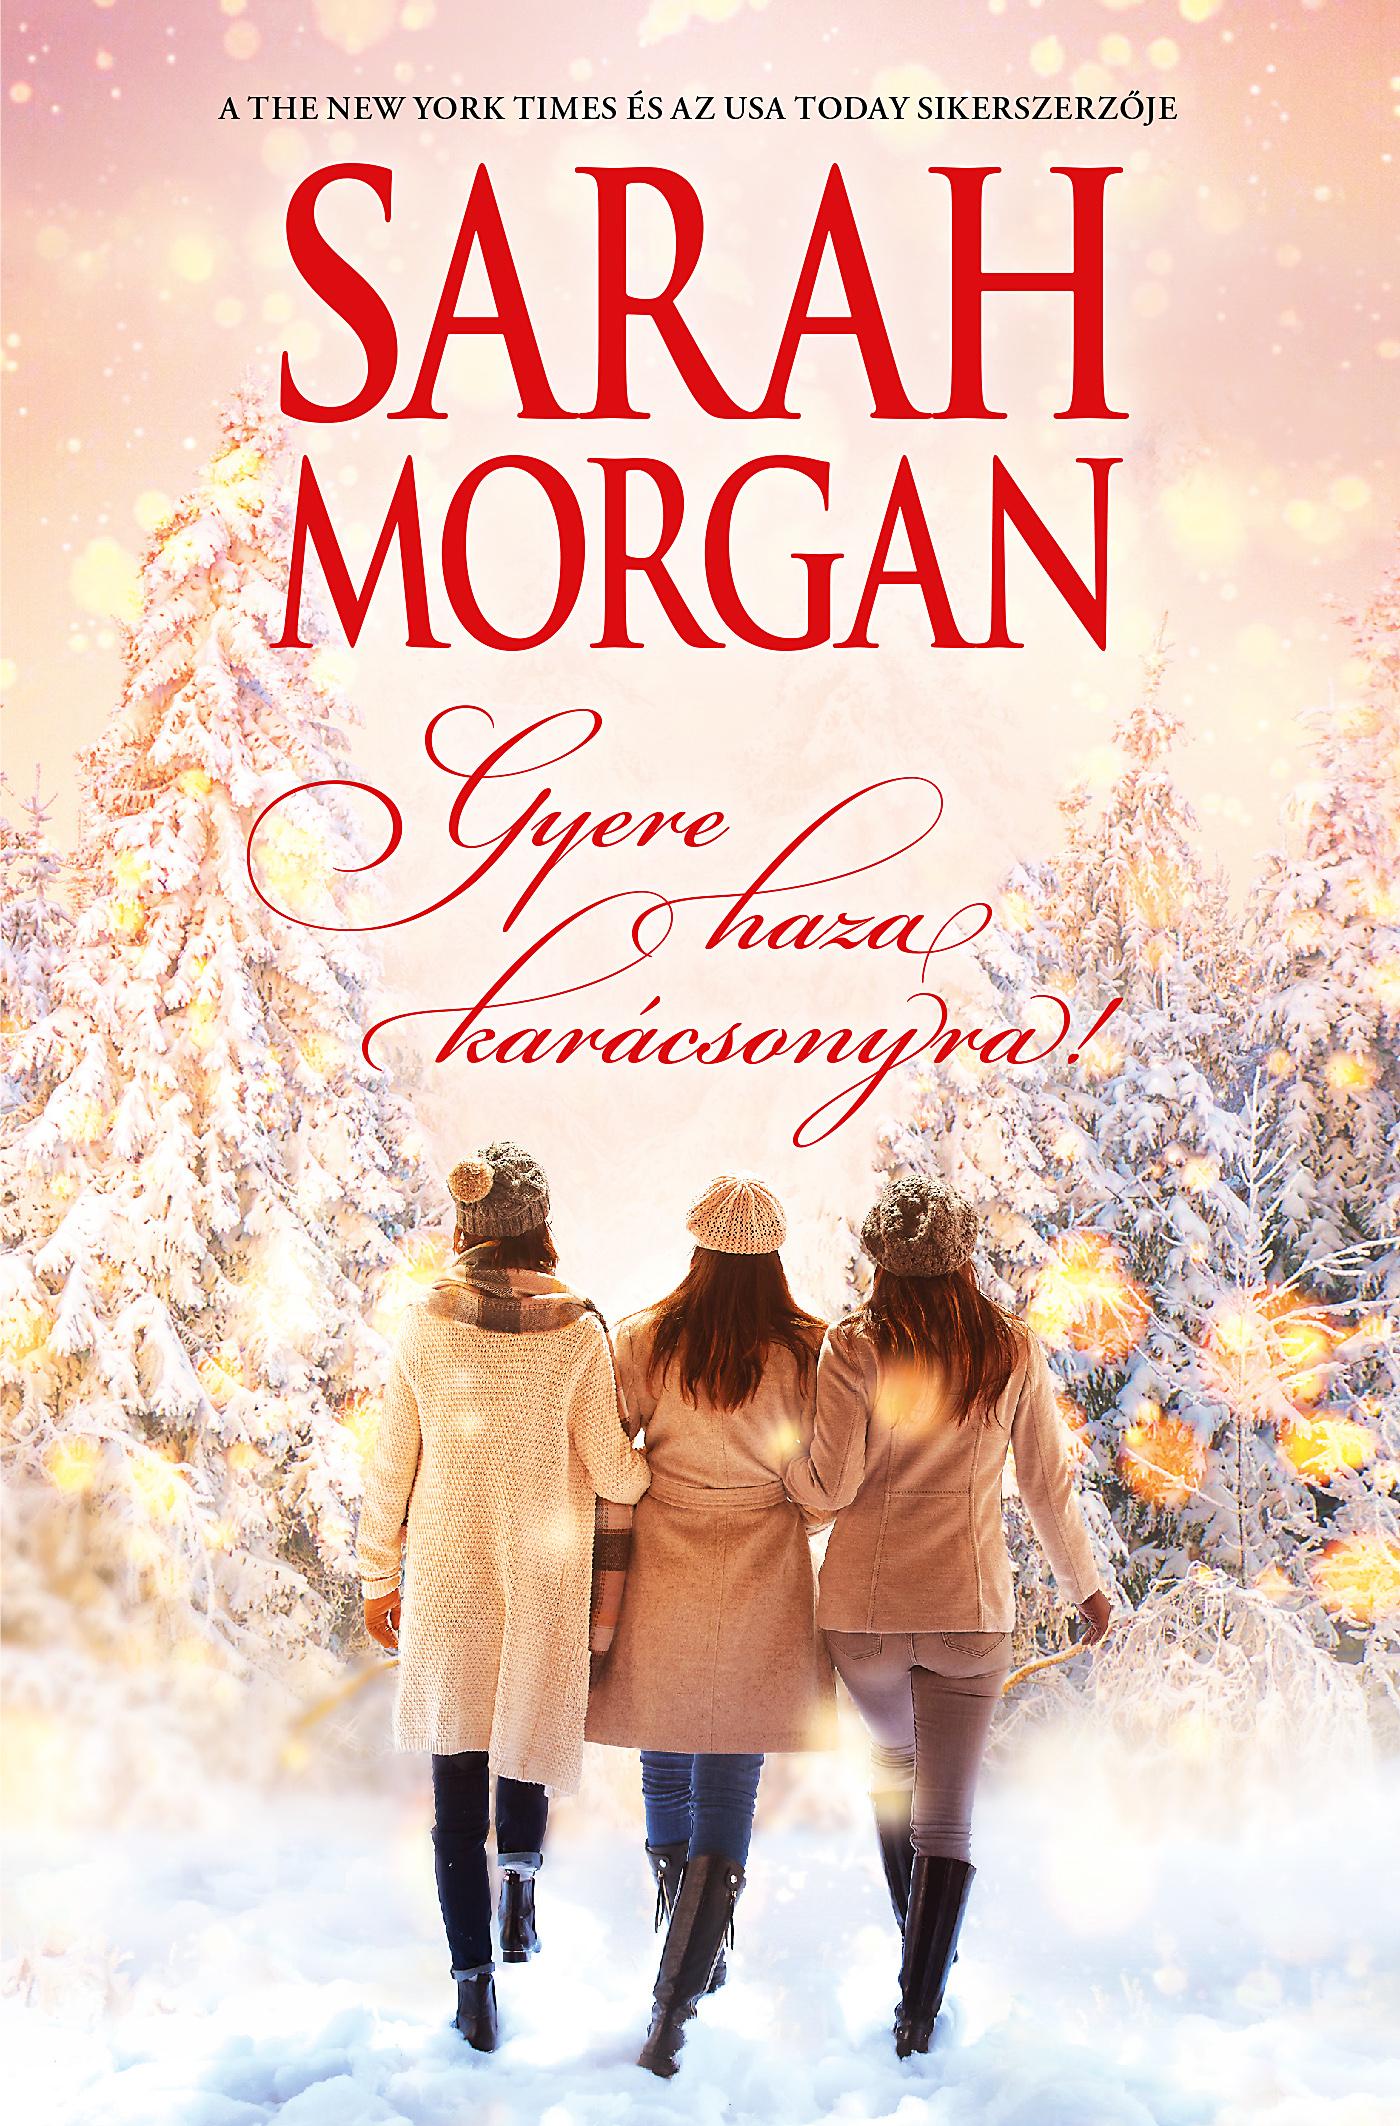 Sarah Morgan - Gyere haza Karácsonyra